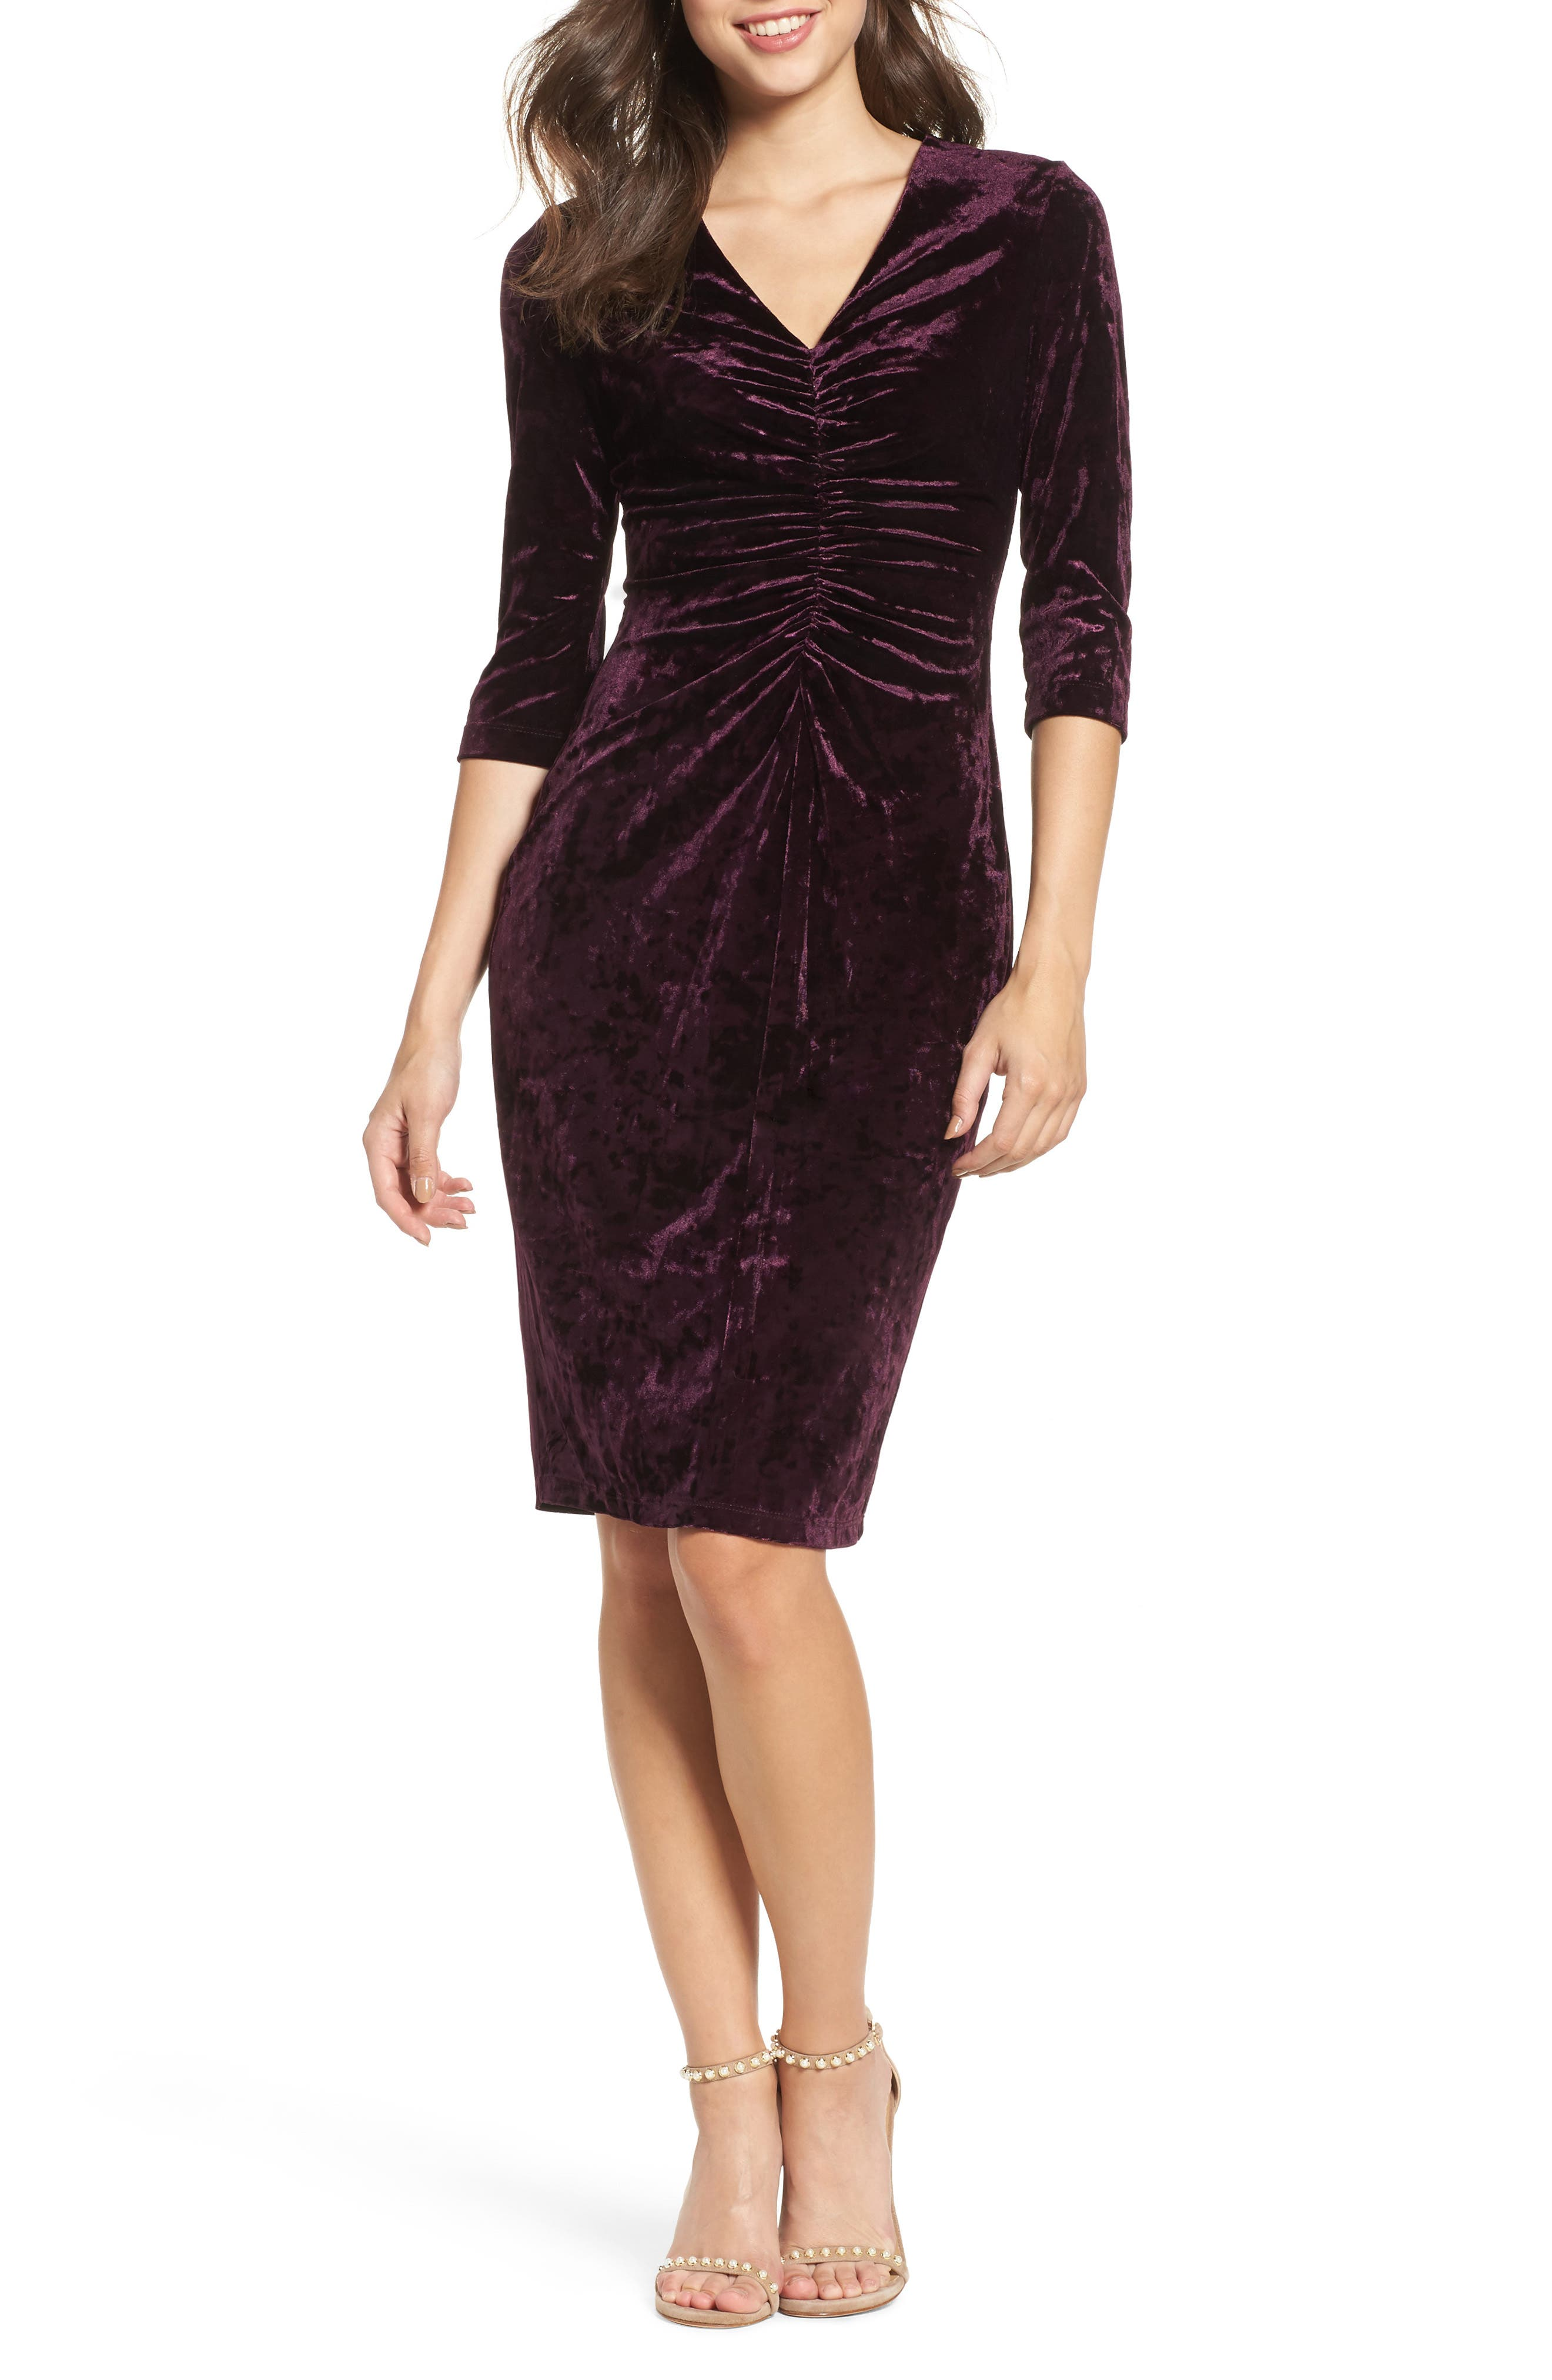 Jules b evening dresses resale